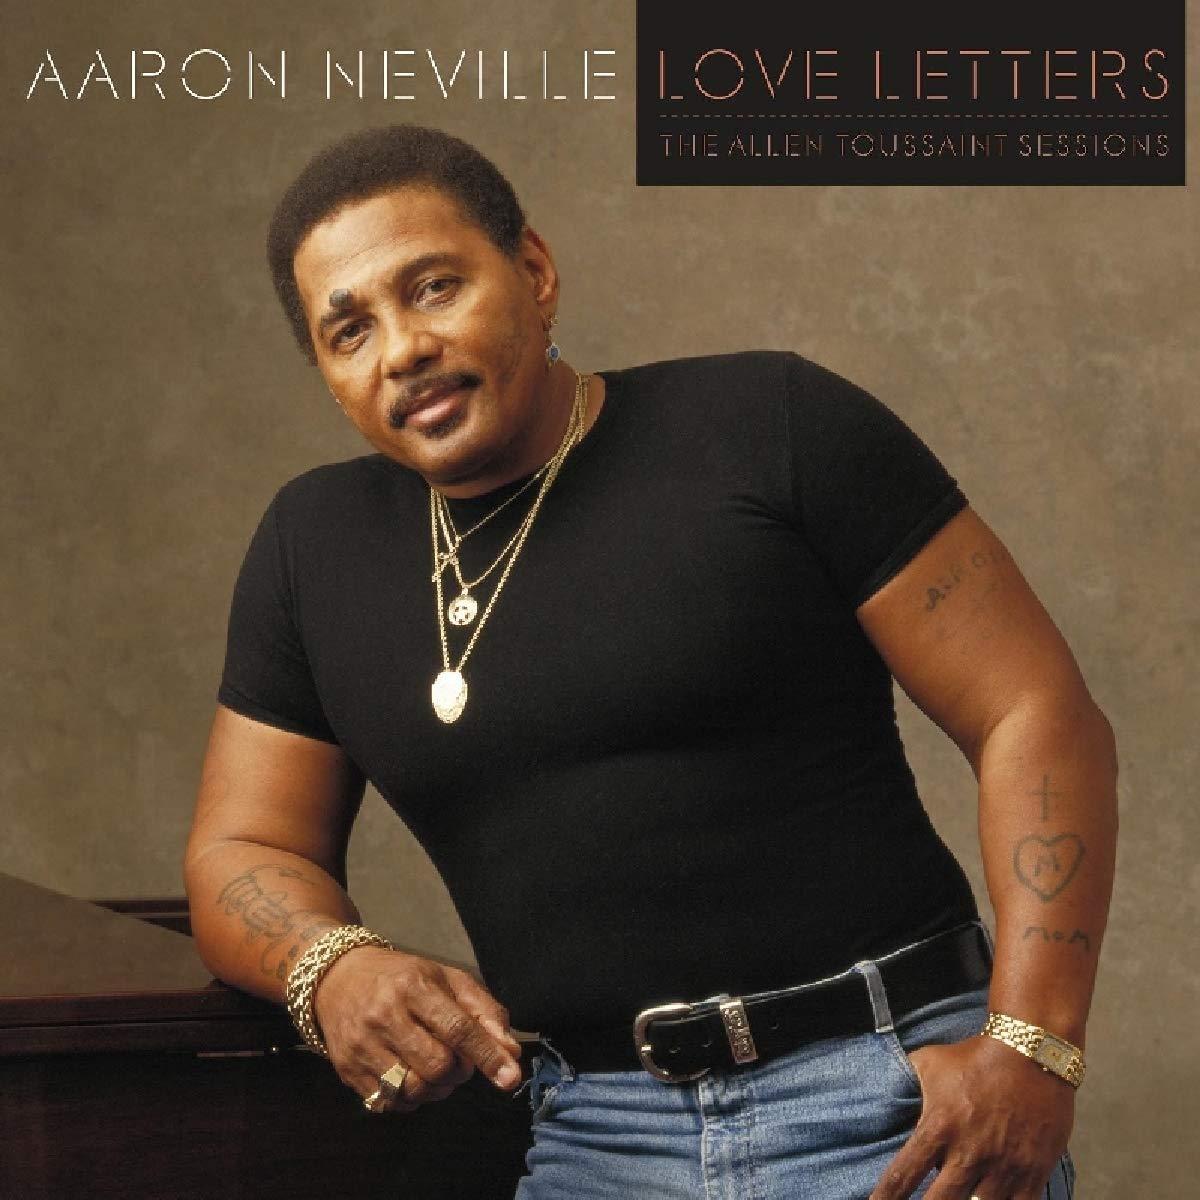 Aaron Nevile - Love Letters